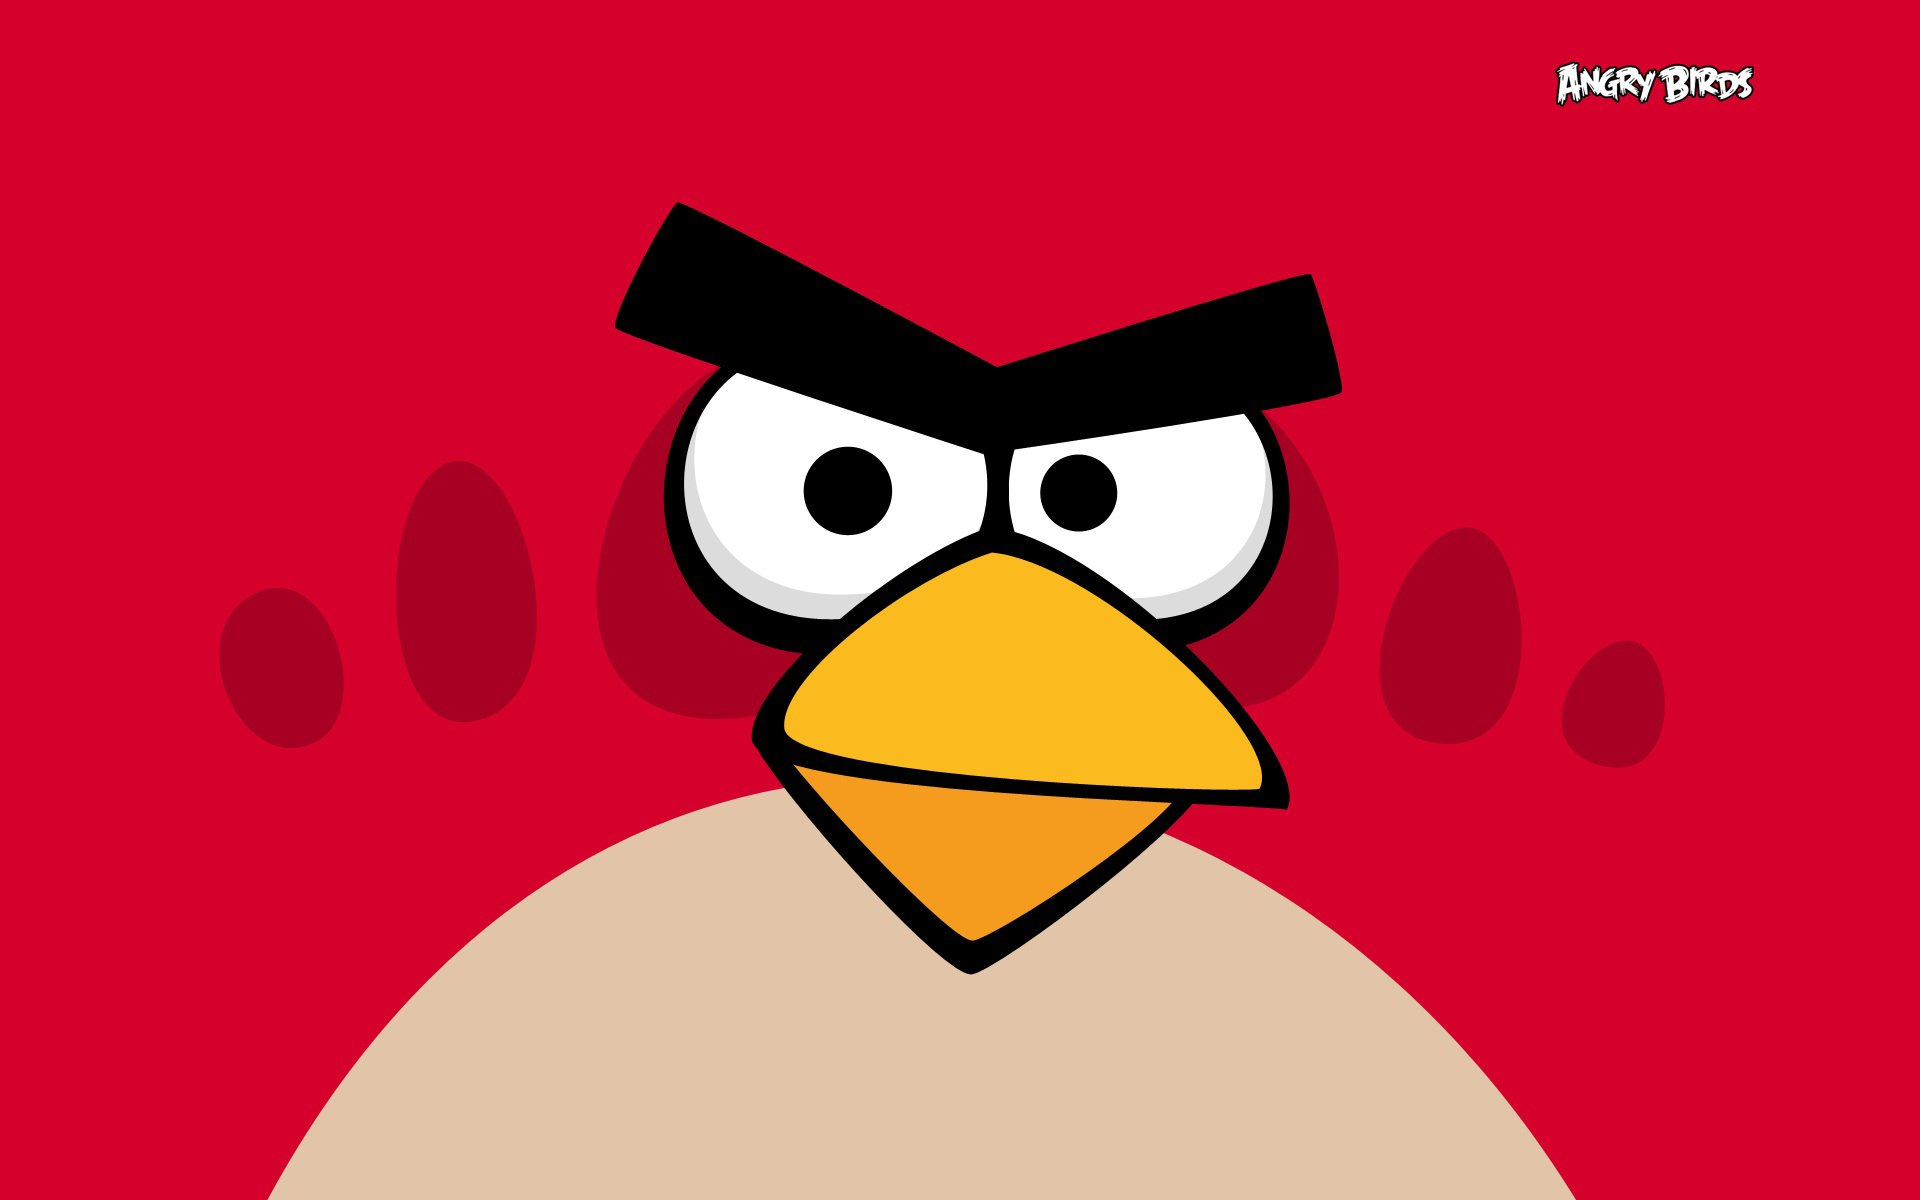 http://www.sostav.ru/publication/angry-birds-poluchat-sobstvennyj-telekanal-1891.html